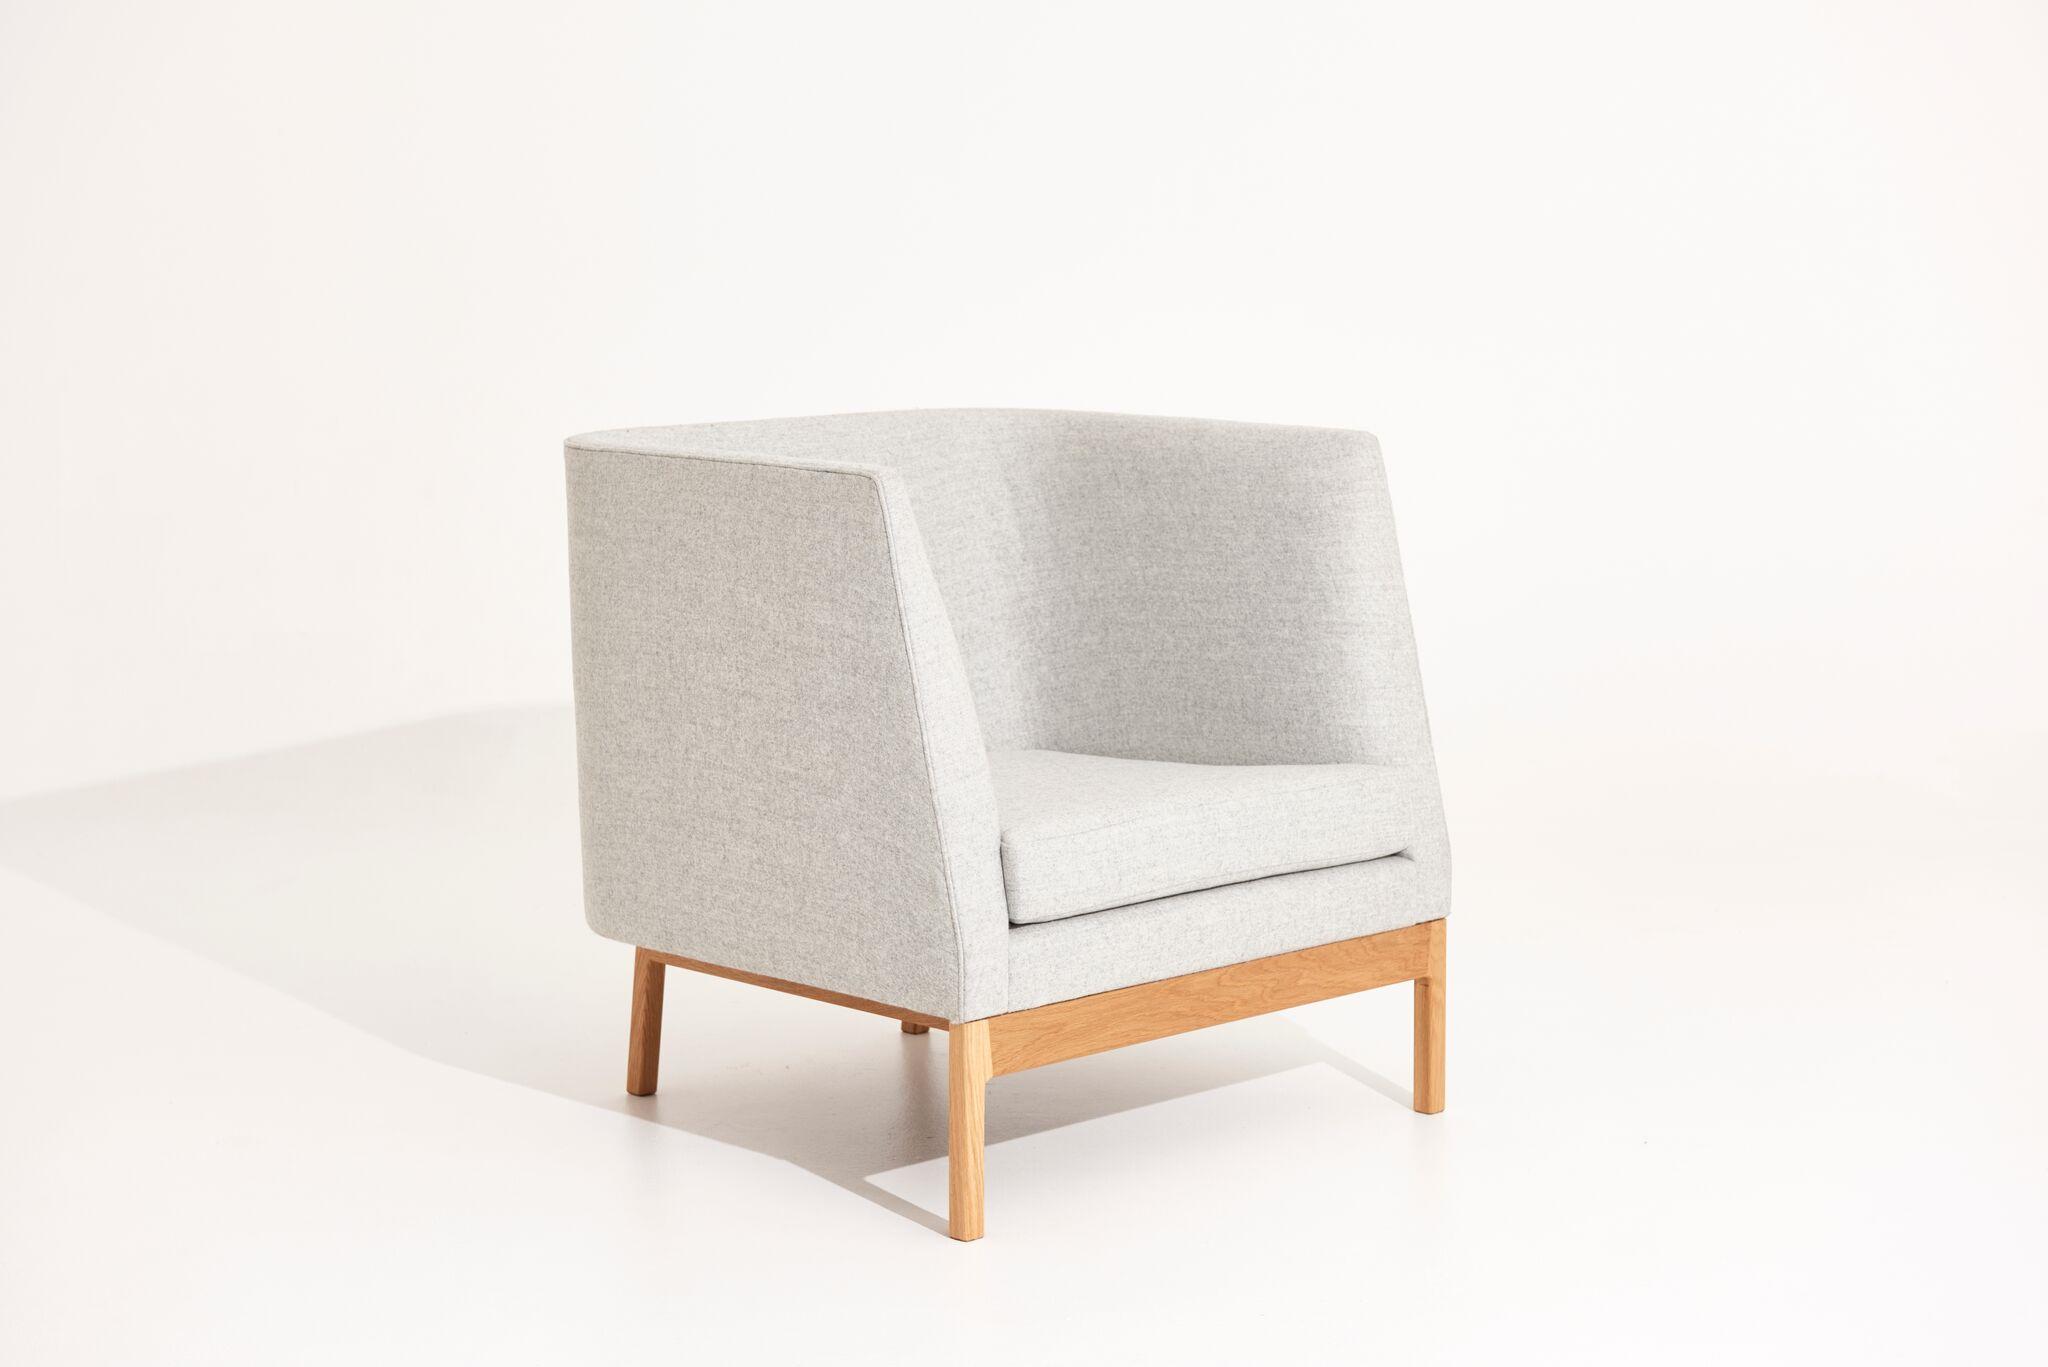 Gallery Of Heir Armchair By Apparentt Local Australian Handcrafted & Bespoke Design Richmond, Melbourne Image 6